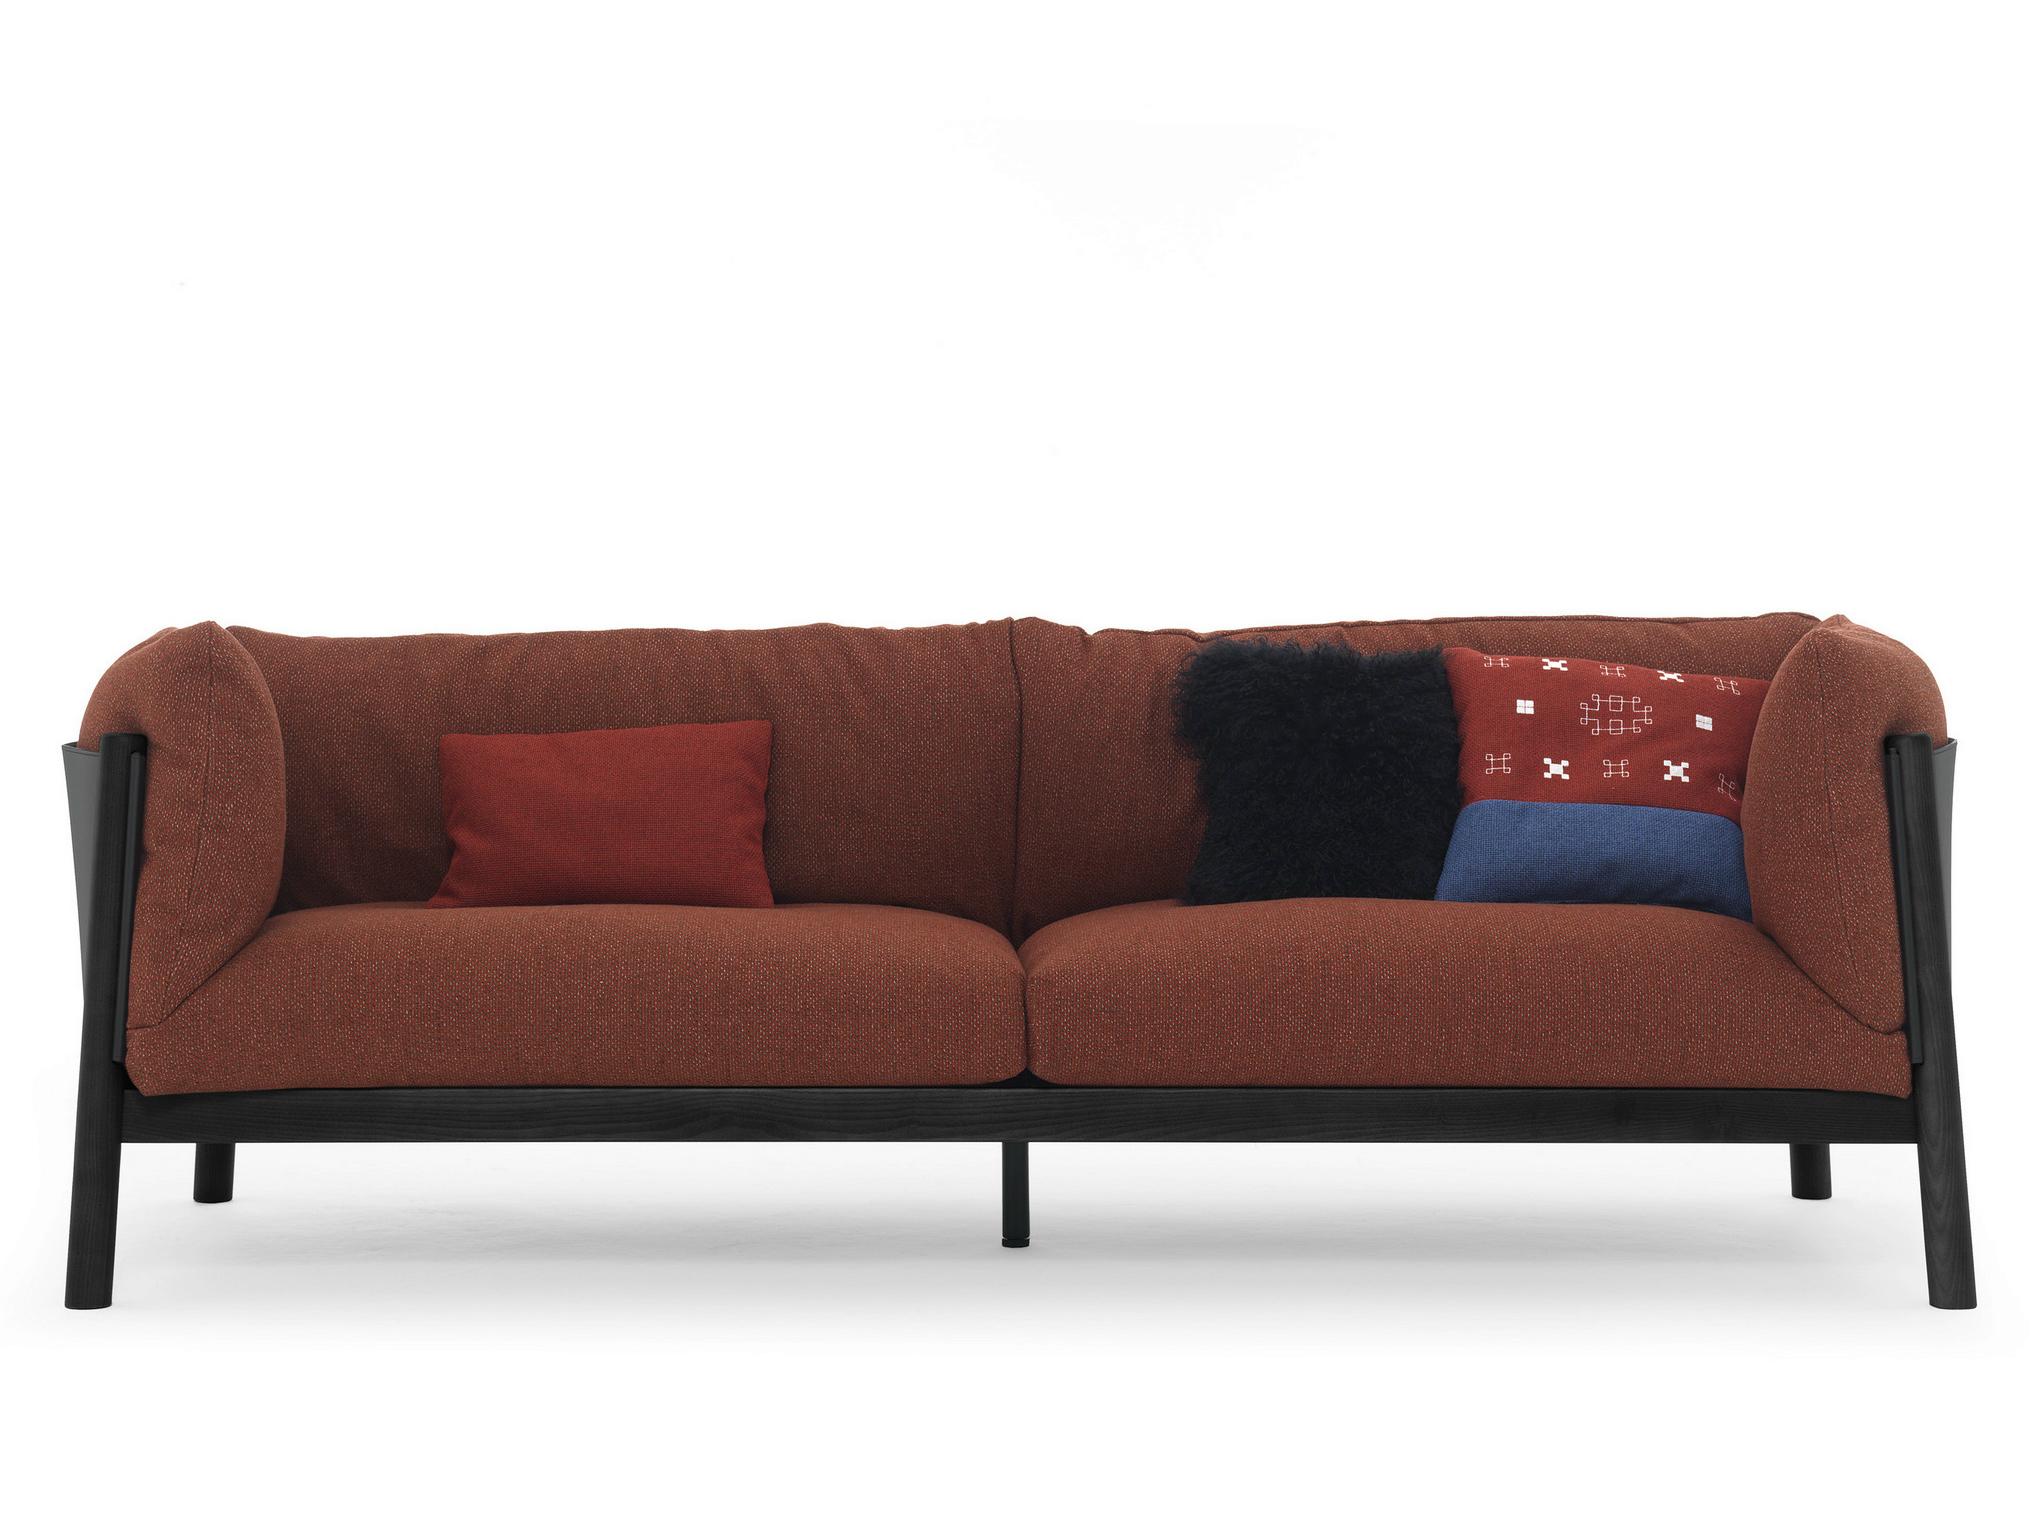 Yak Sofa by LucidiPevere for De Padova